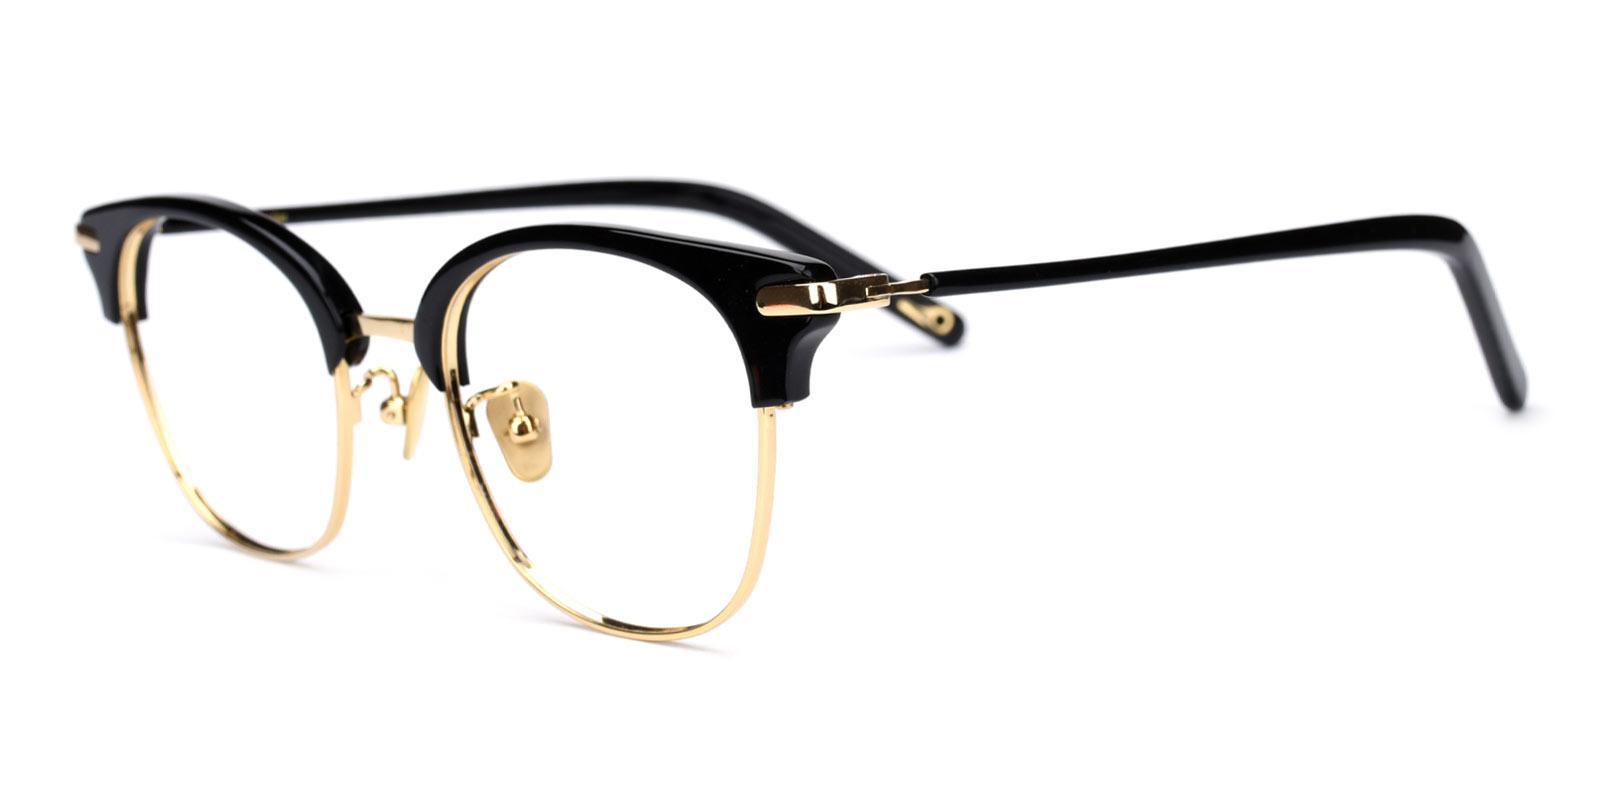 Baron-Black-Browline-Titanium-Eyeglasses-detail